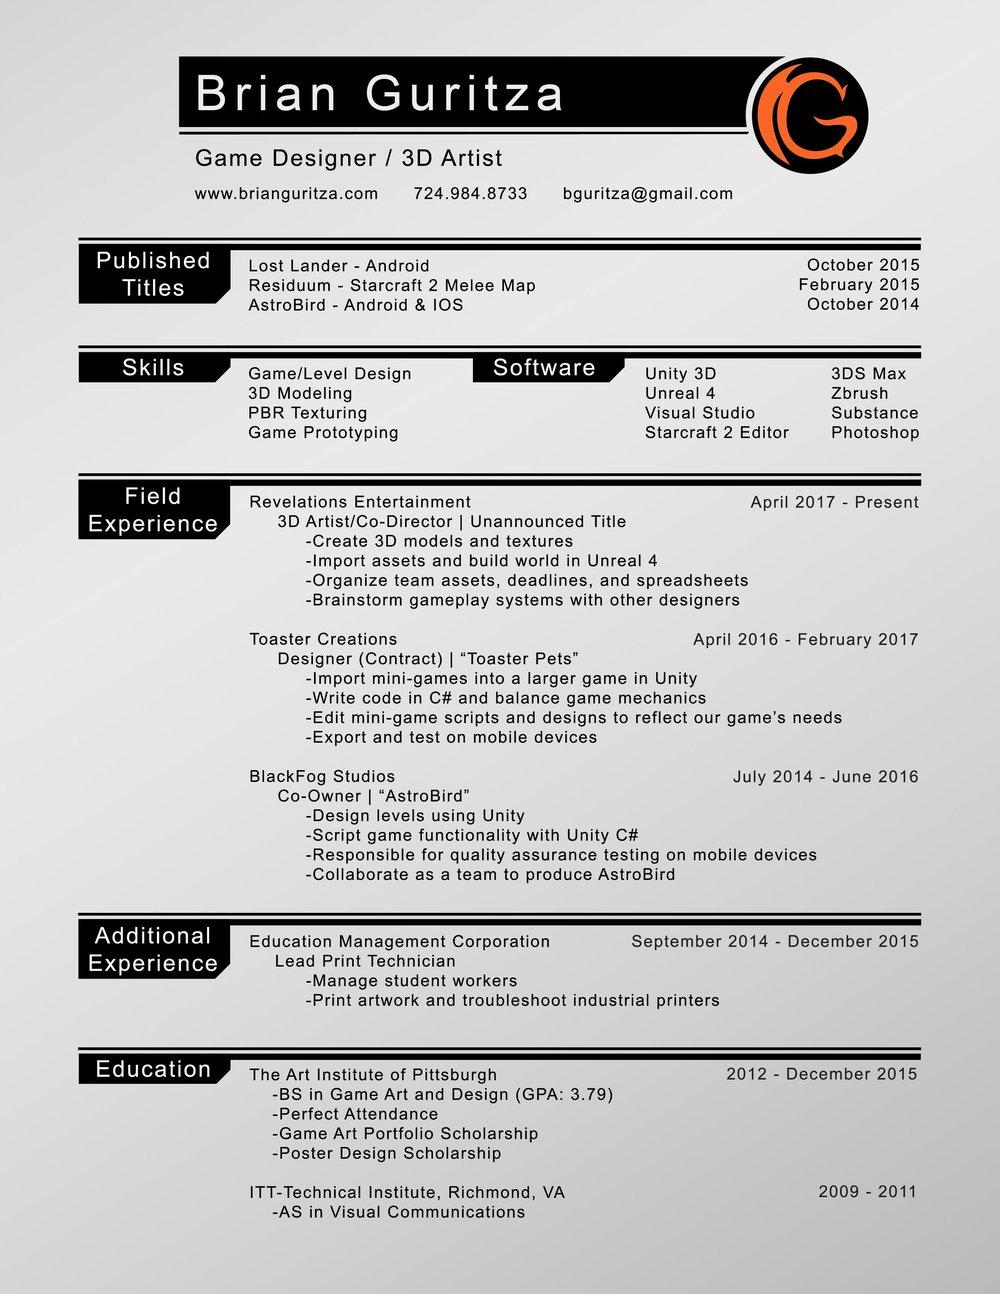 BG_Resume.jpg